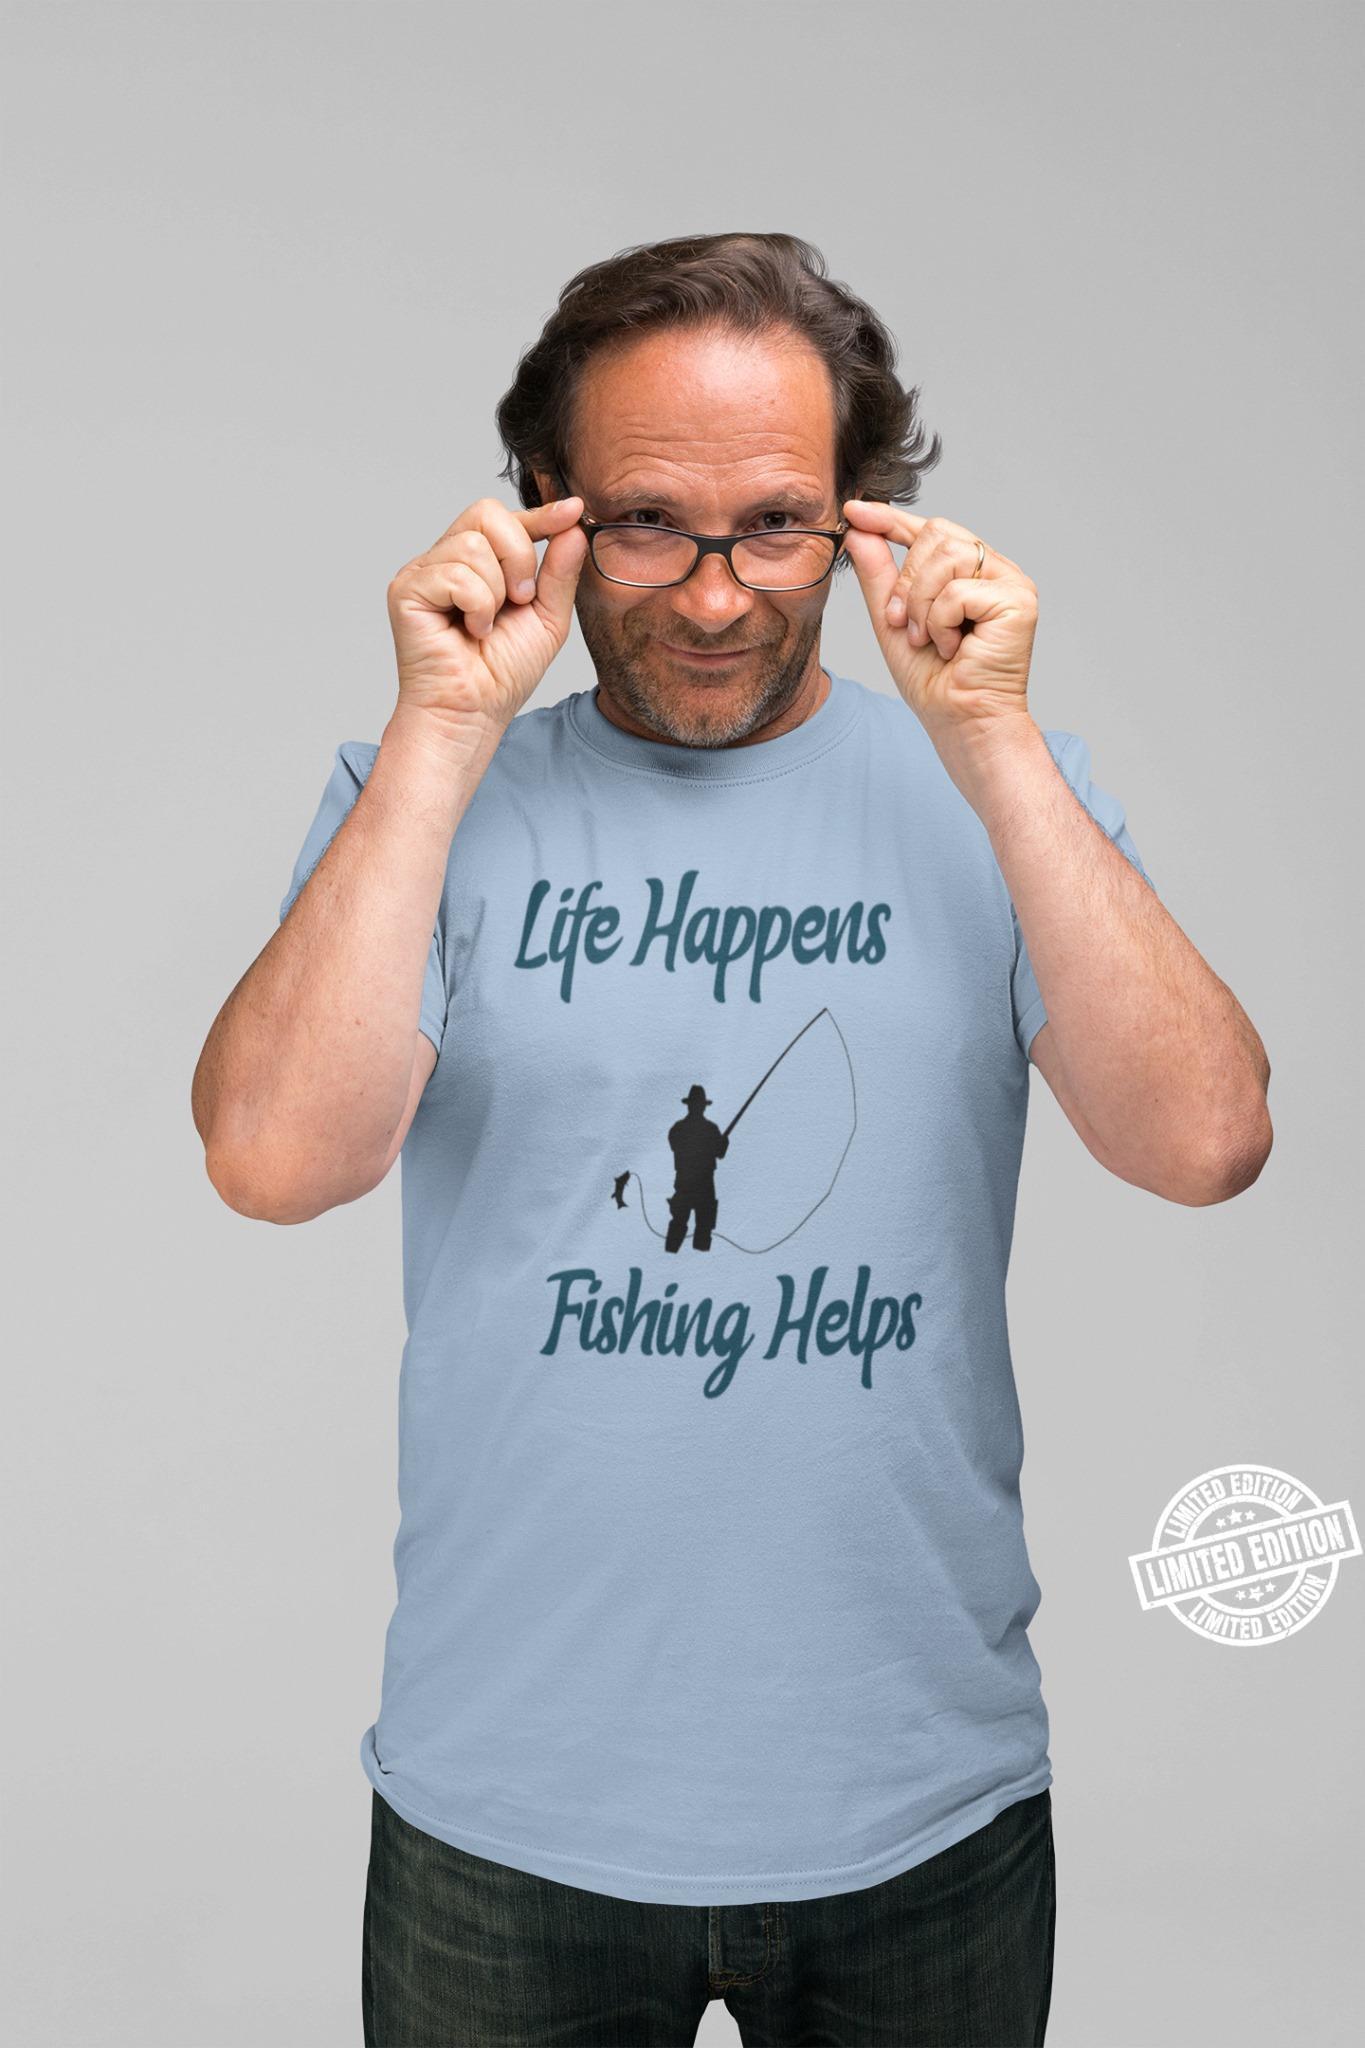 Life happens fishing helps shirt